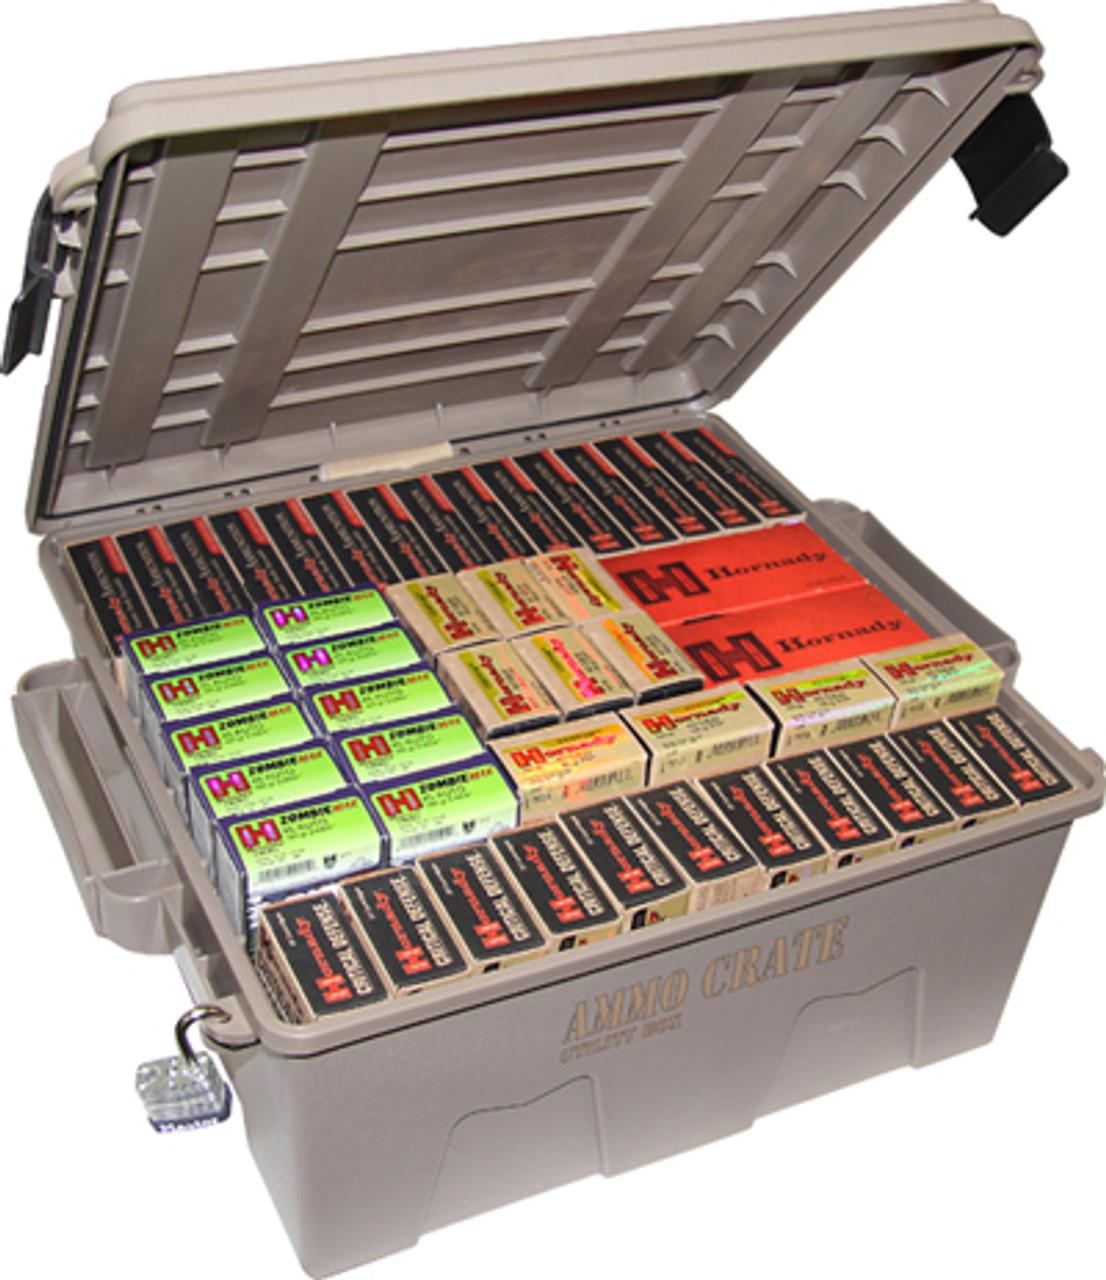 Military Ammo Box Ammunition Crate Utility Box Plastic Ammo Storage Case Medium